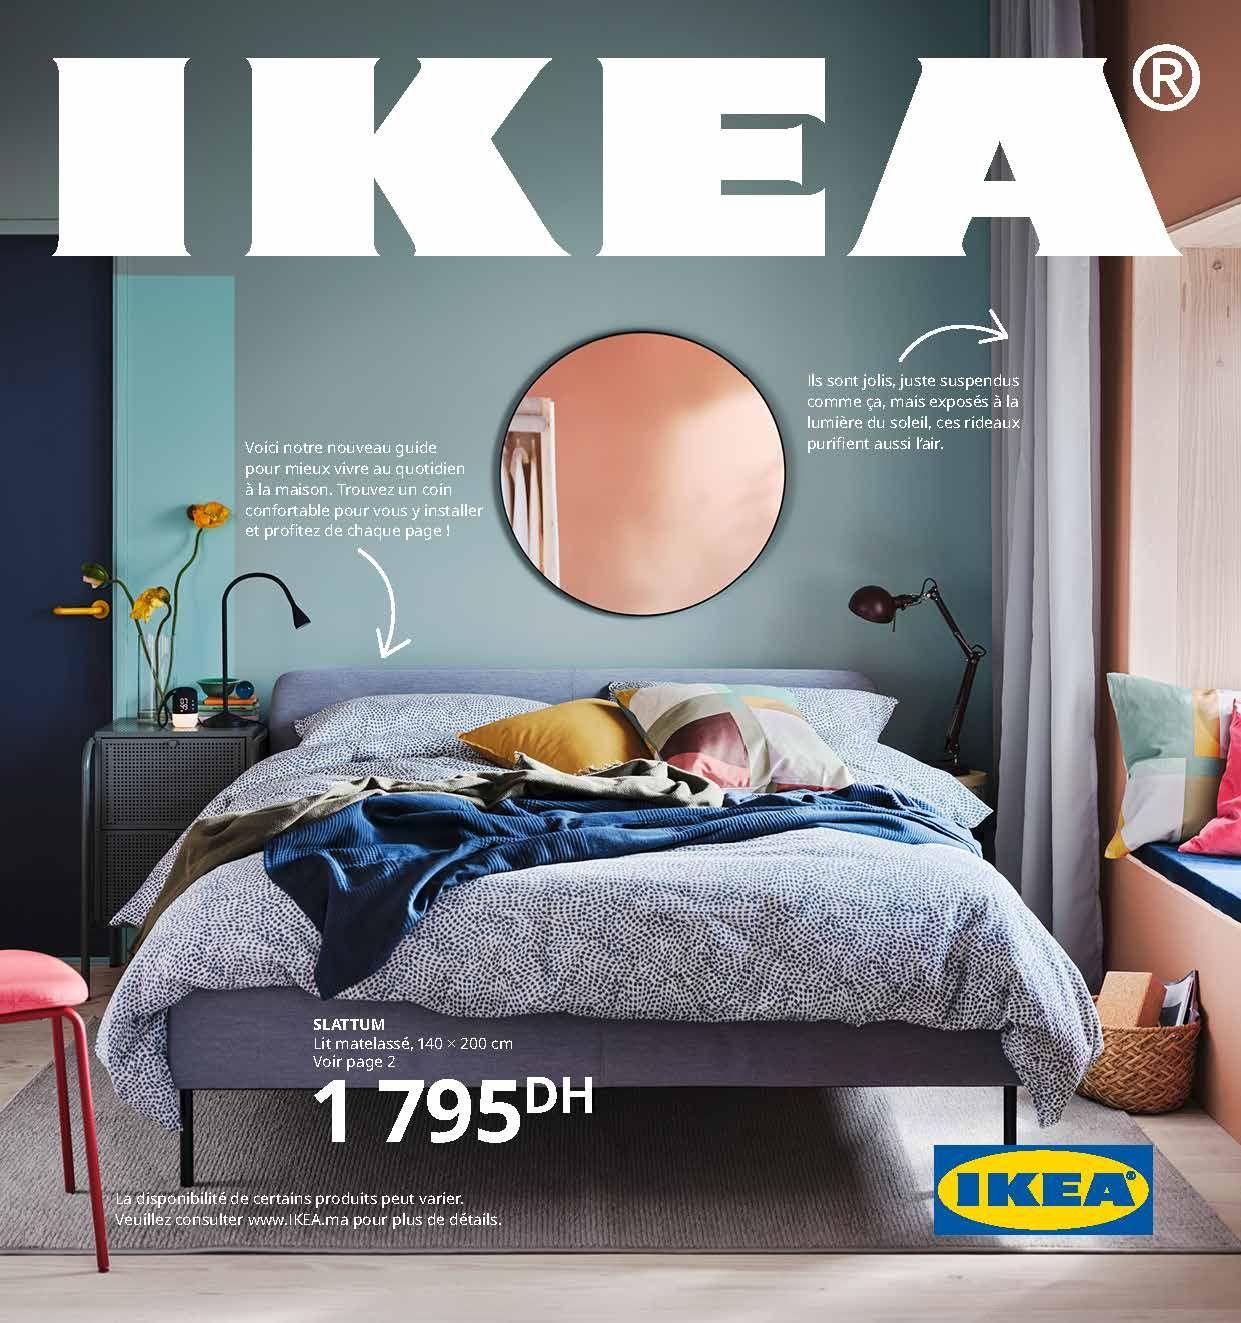 Catalogue Ikea Maroc 2021 Ikea Catalog Ikea Ikea New